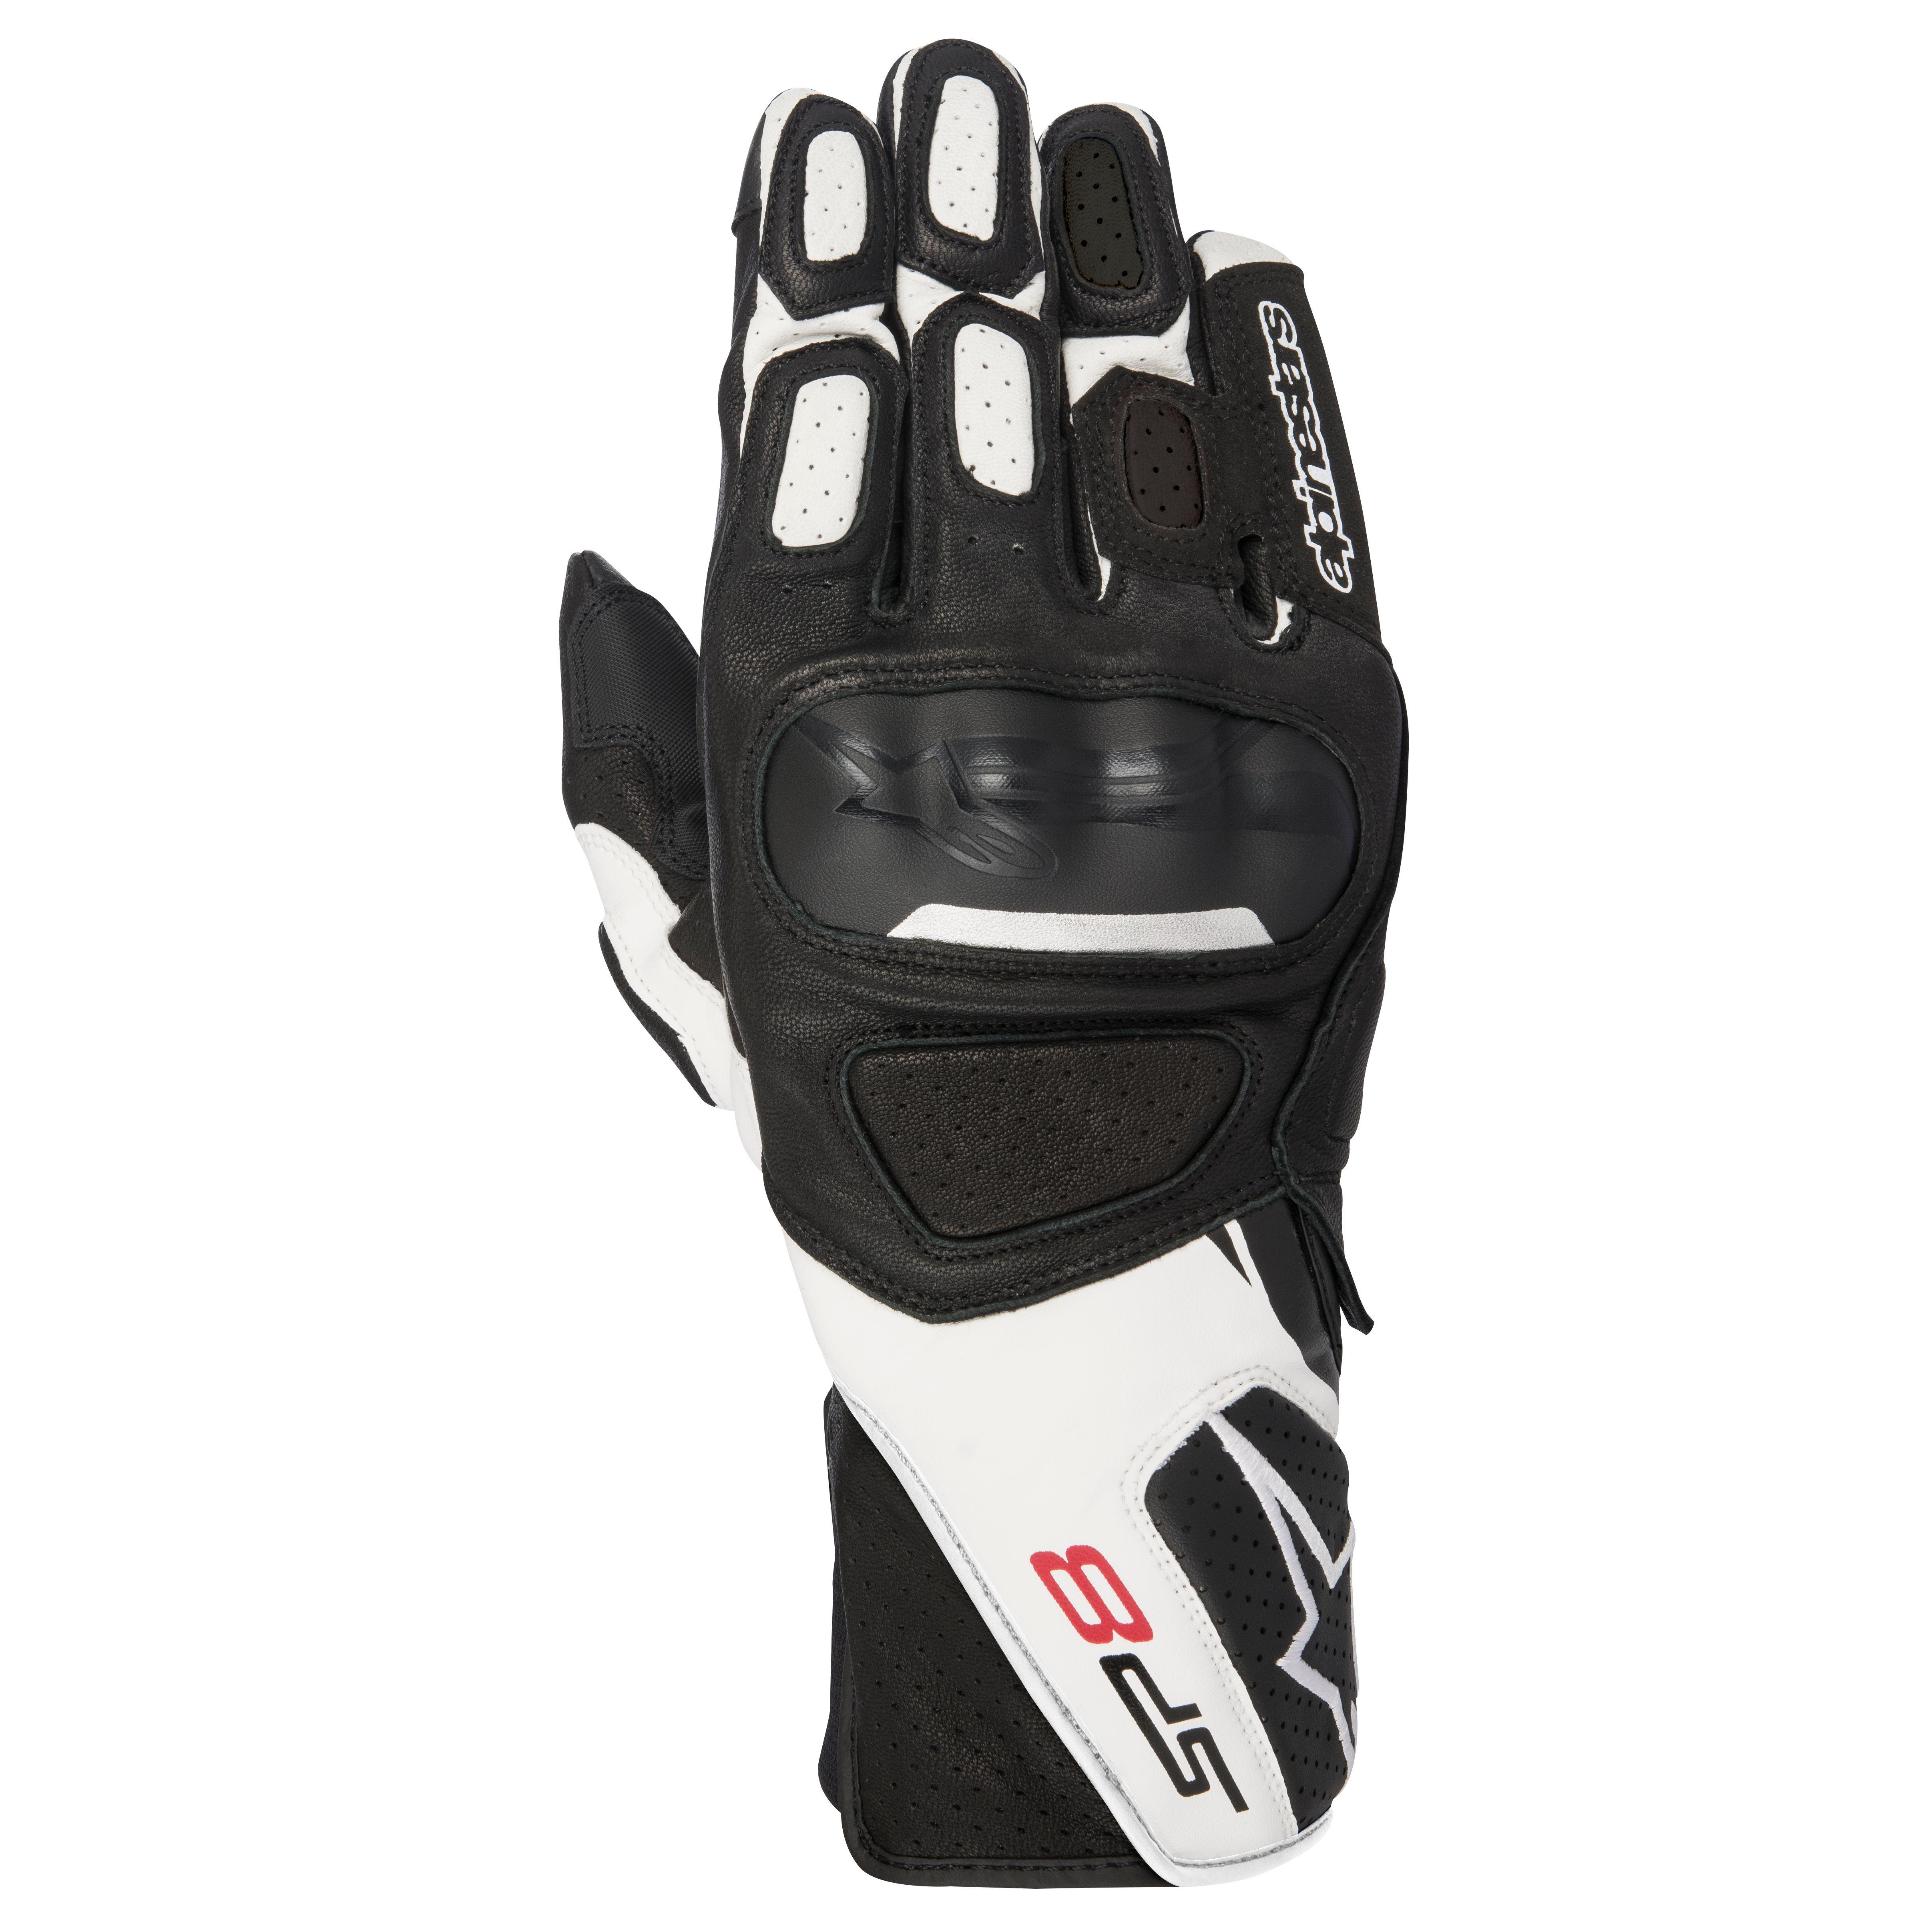 Alpinestars Gants moto Sp-8 V2 Gloves Black White Yellow Fluo Noir//Blanc//Jaune XL